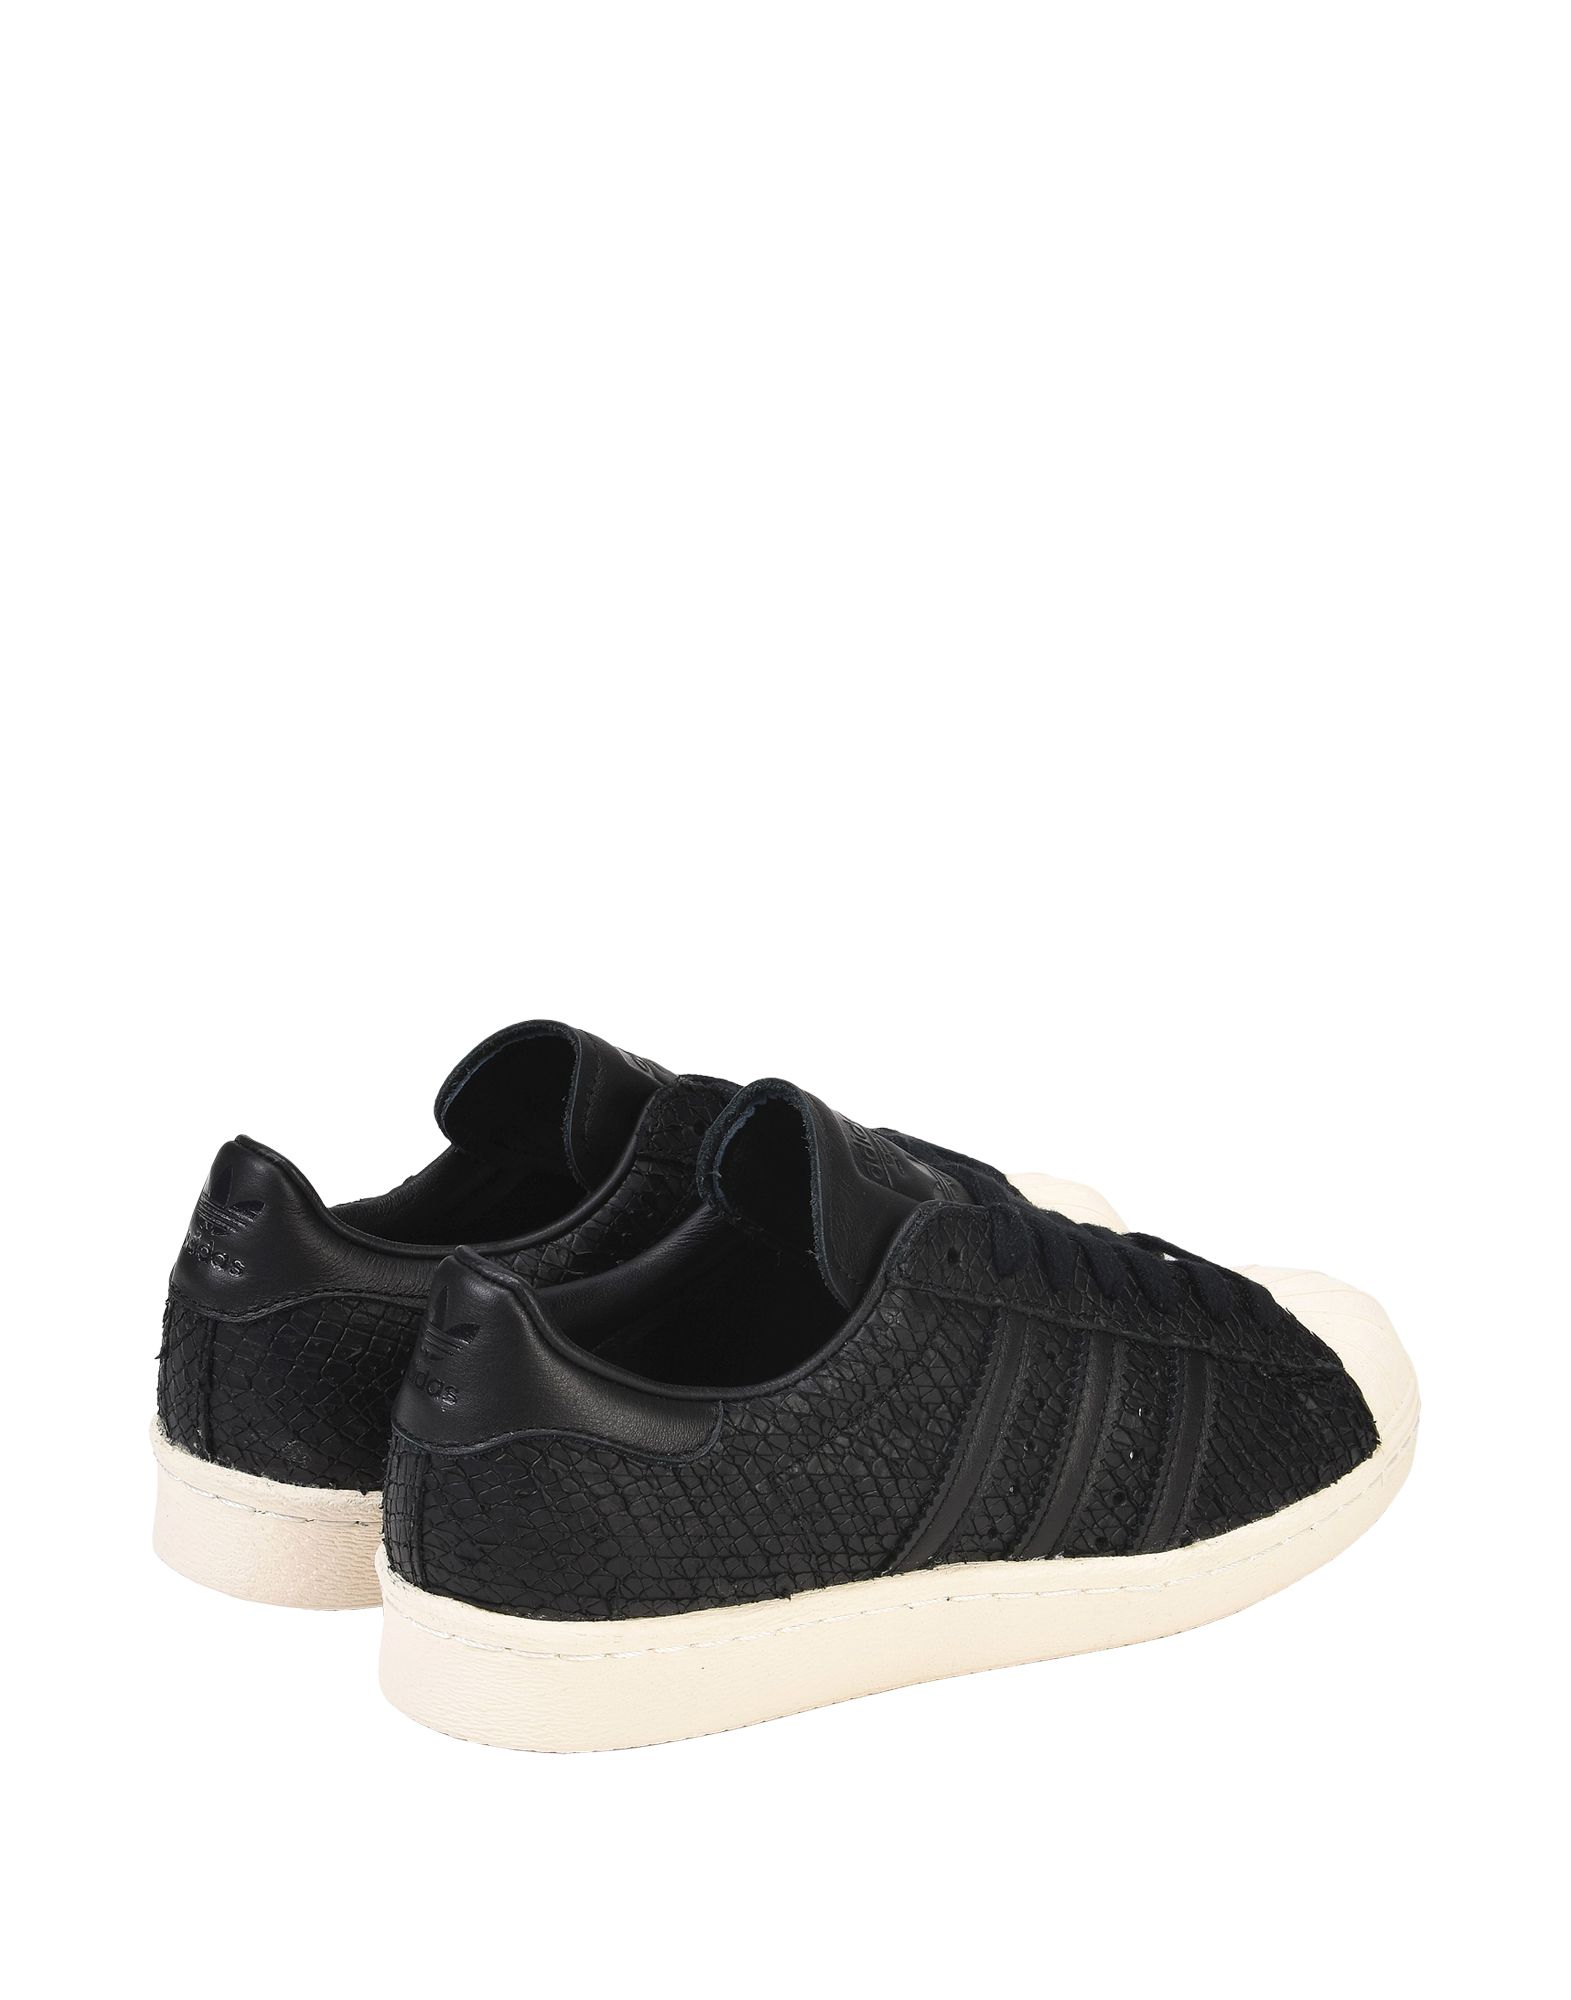 Sneakers Adidas Originals Superstar 80S W - Femme - Sneakers Adidas Originals sur